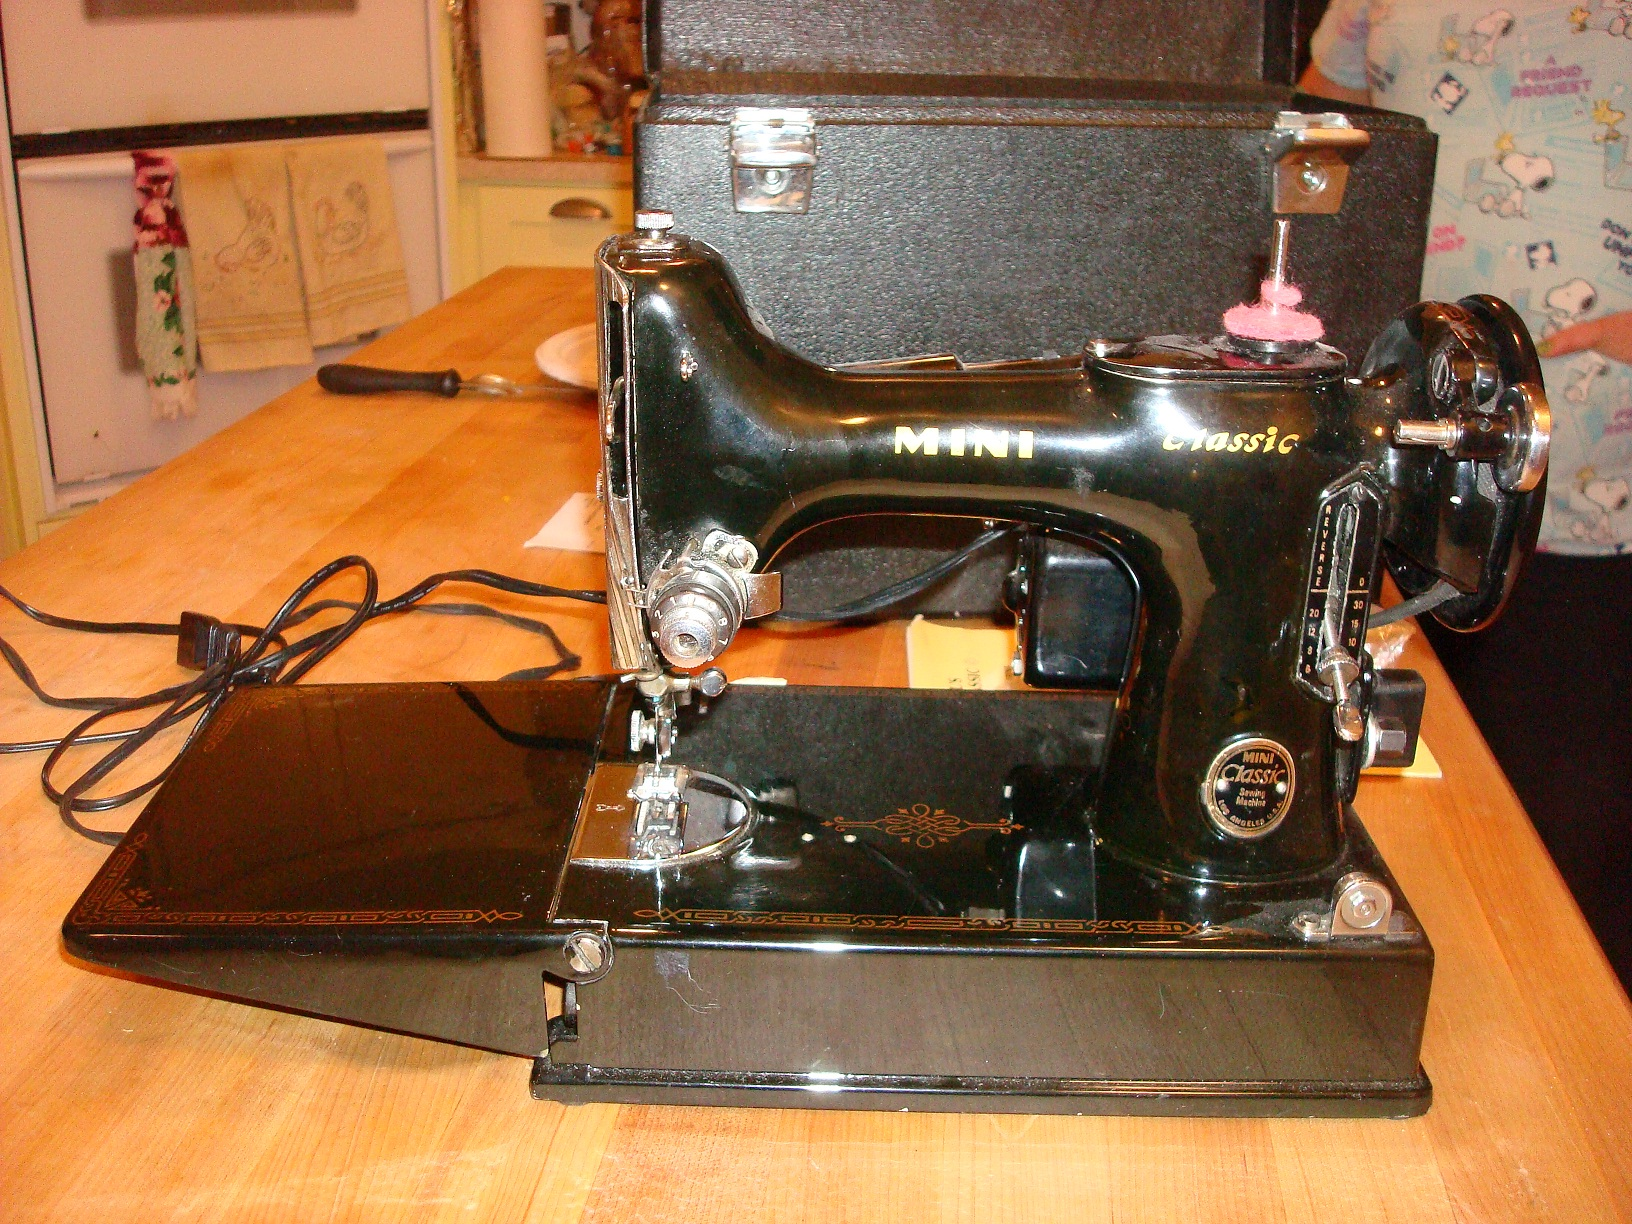 Mal's mini sewing machine - Quiltingboard Forums